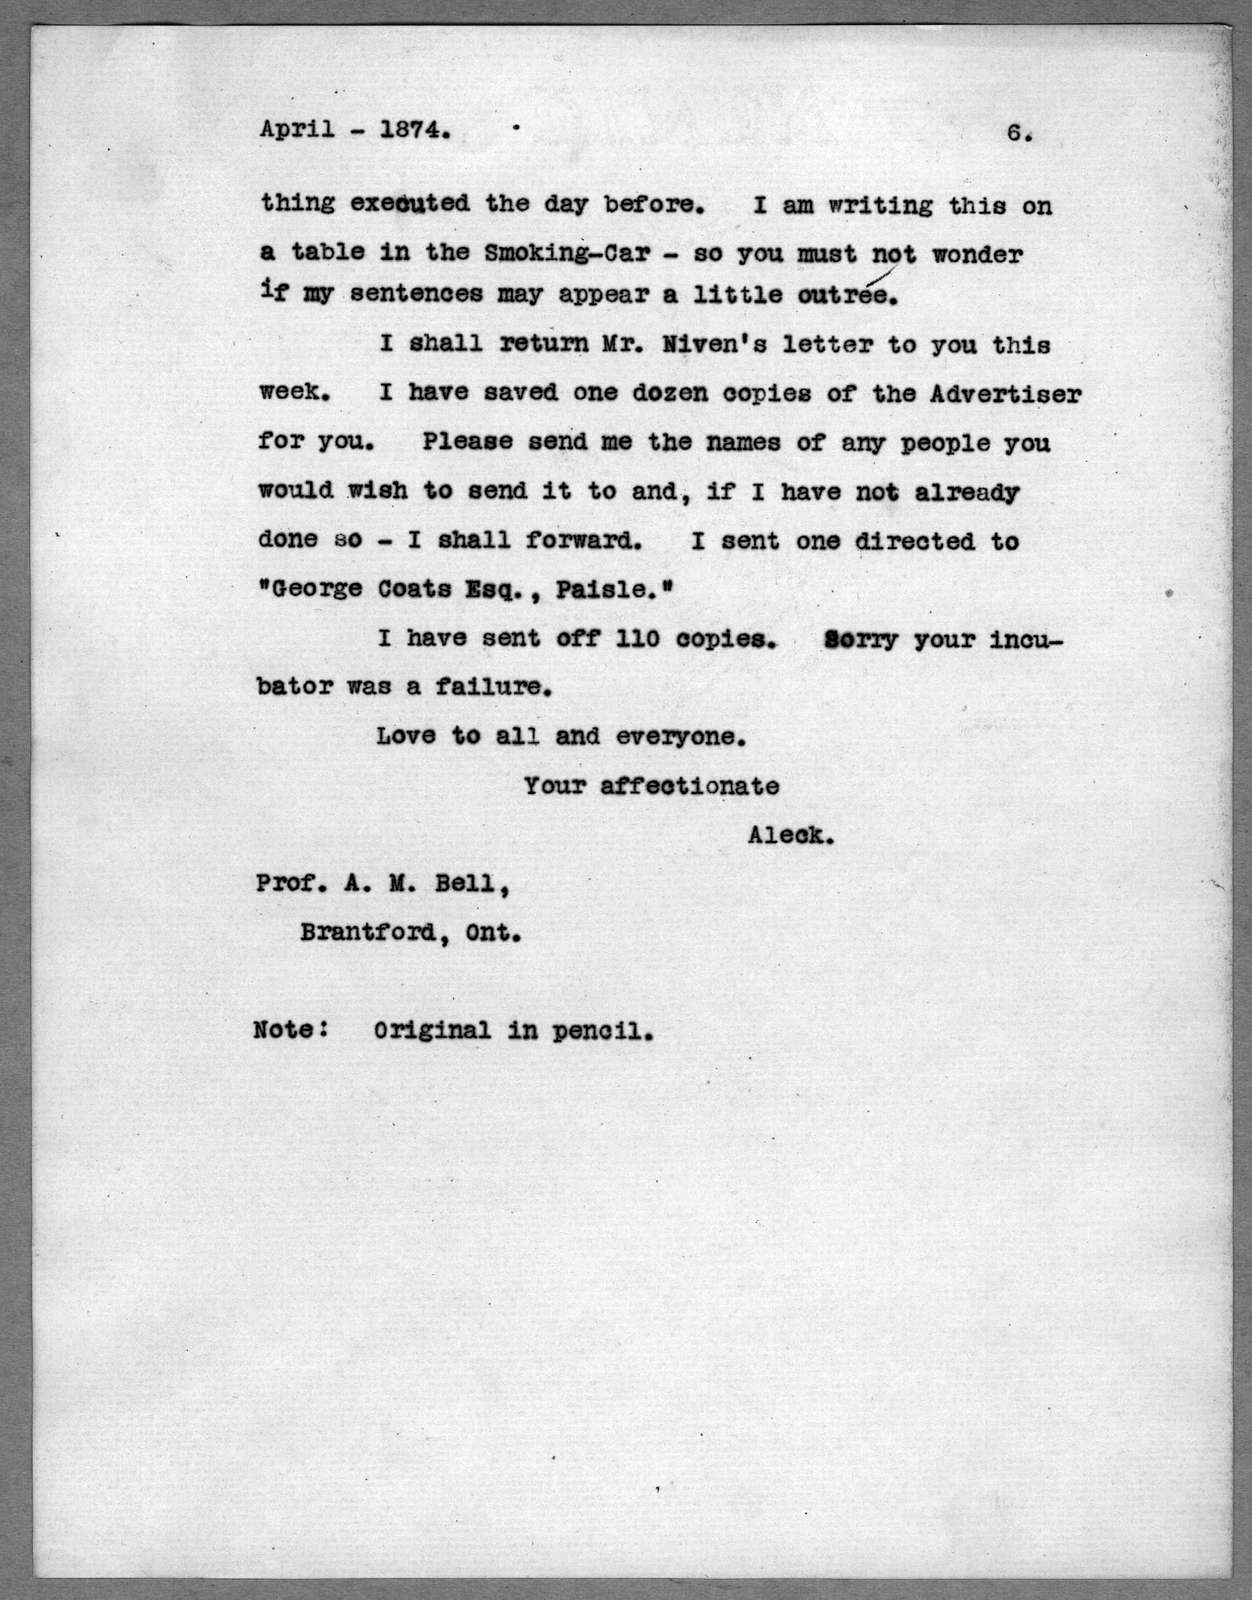 Letter from Alexander Graham Bell to Alexander Melville Bell, Eliza Symonds Bell, Carrie Bell, Charles J. Bell, April 1874